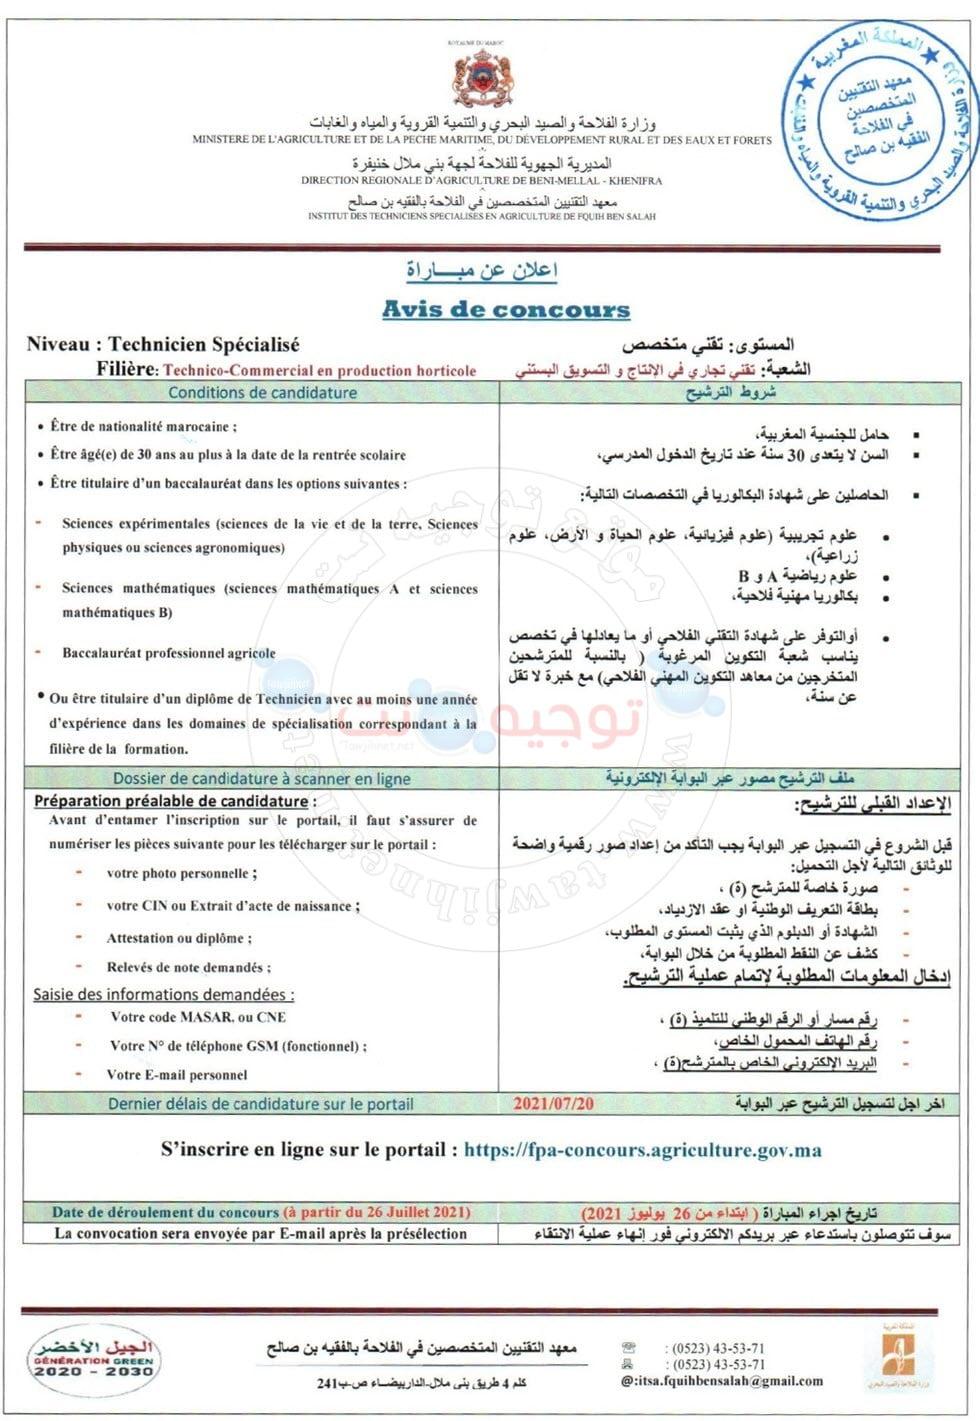 Concours Institut TS Agriculture Fquih Ben Salah 2021 Technico Commercial en Production Horticole (شعبة تقني تجاري في الانتاج والتسويق البستني)